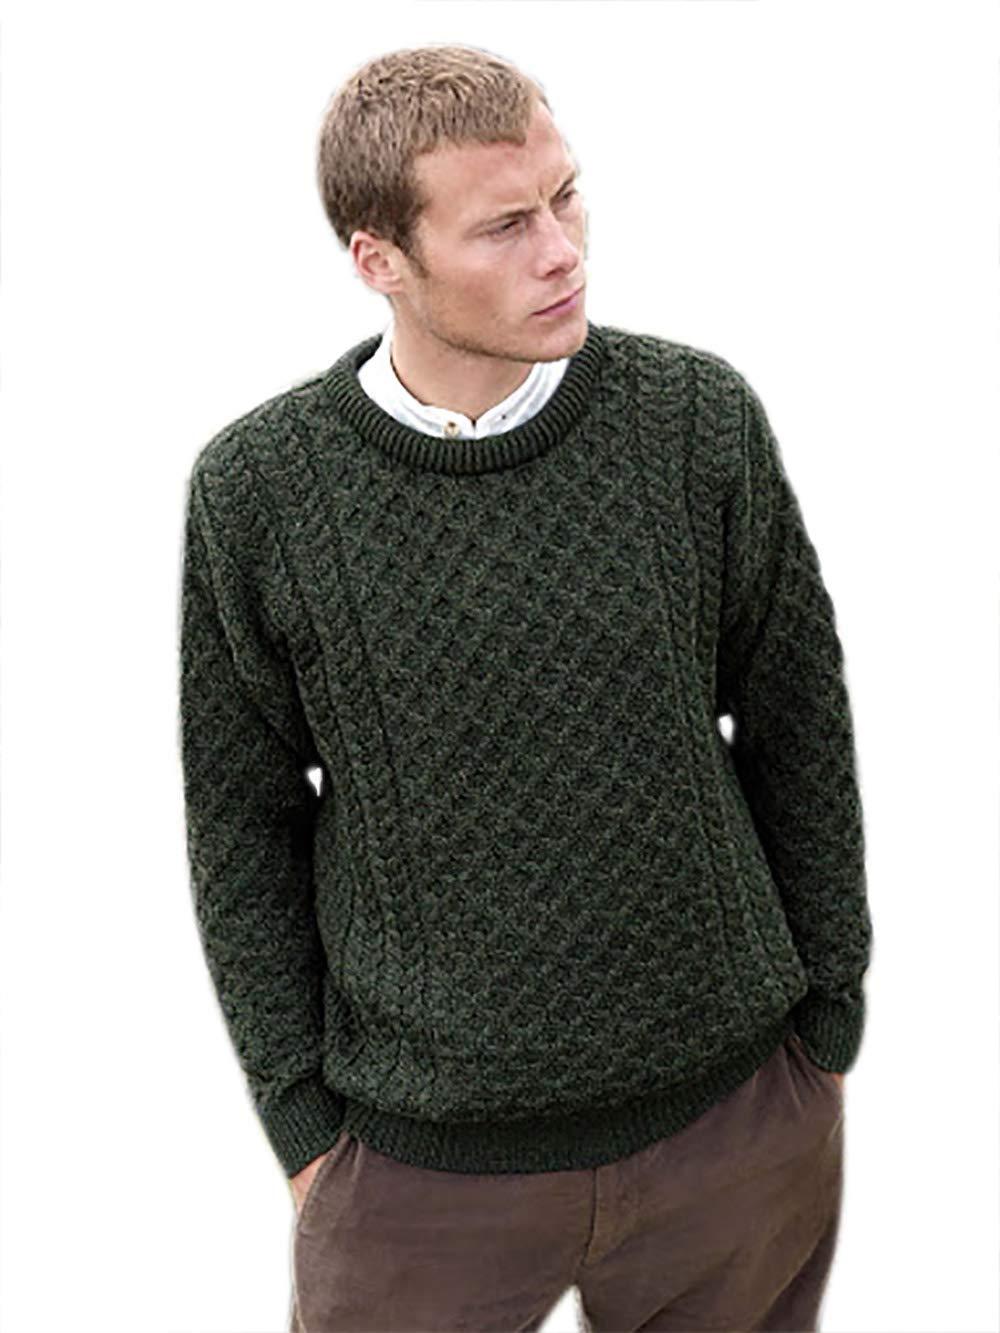 Best Buy 100% Soft Irish Merino Wool Crew Neck Sweater by West End Knitwear Reviews